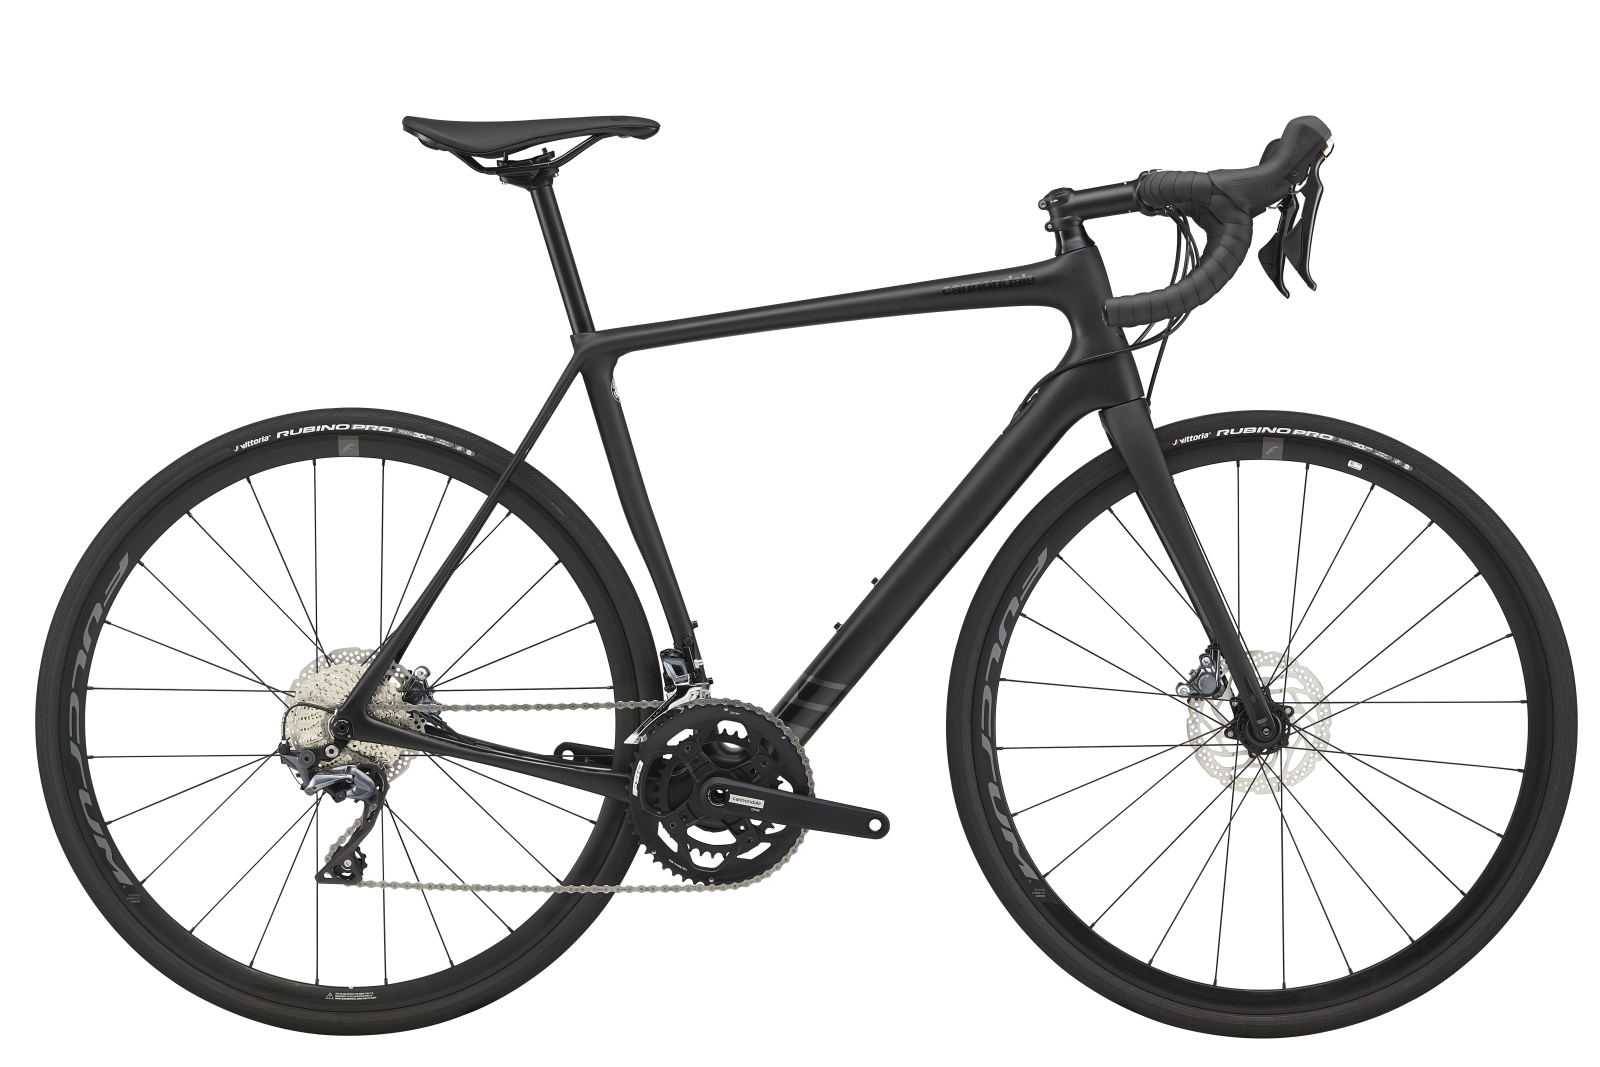 Cannondale Synapse Carbon Ultegra országúti kerékpár - szürke - 56 cm (2020)